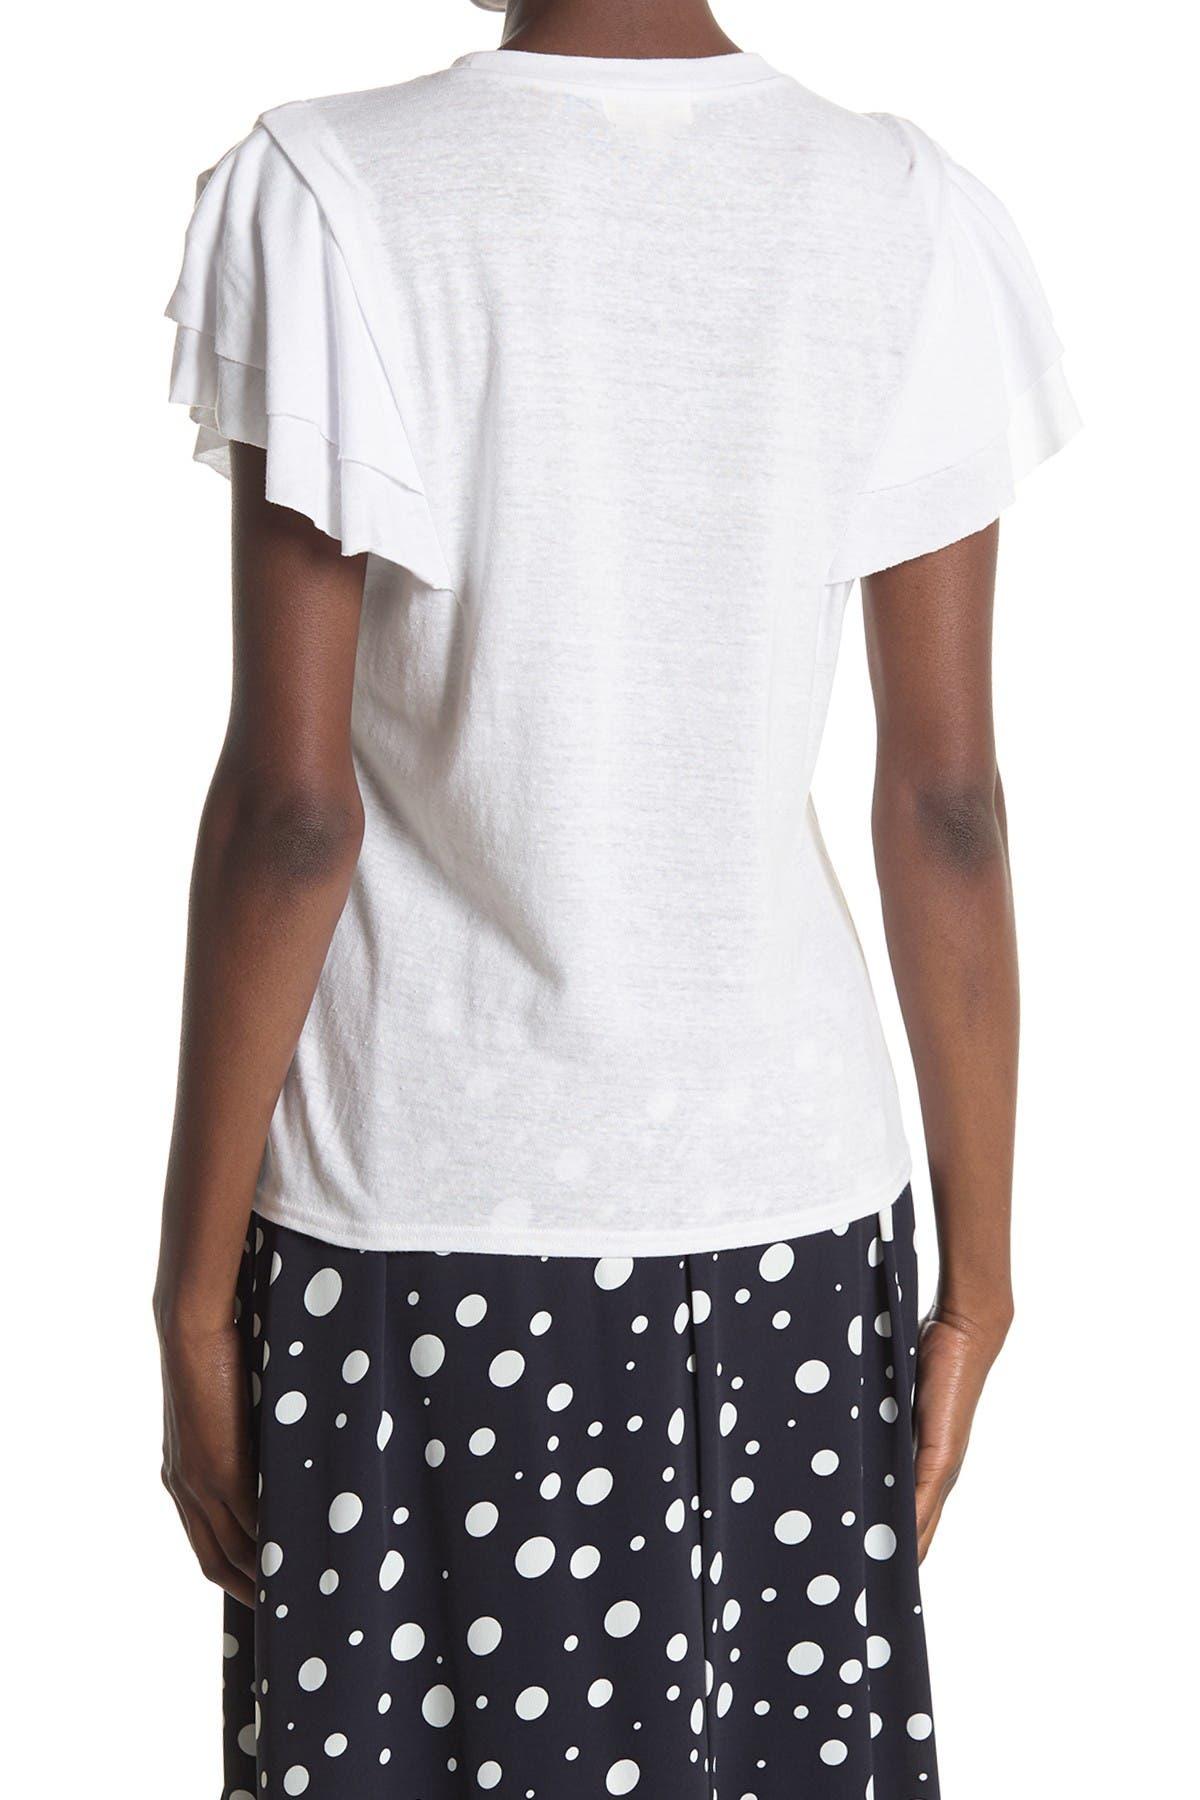 Image of MELLODAY Tiered Ruffle Sleeve T-Shirt